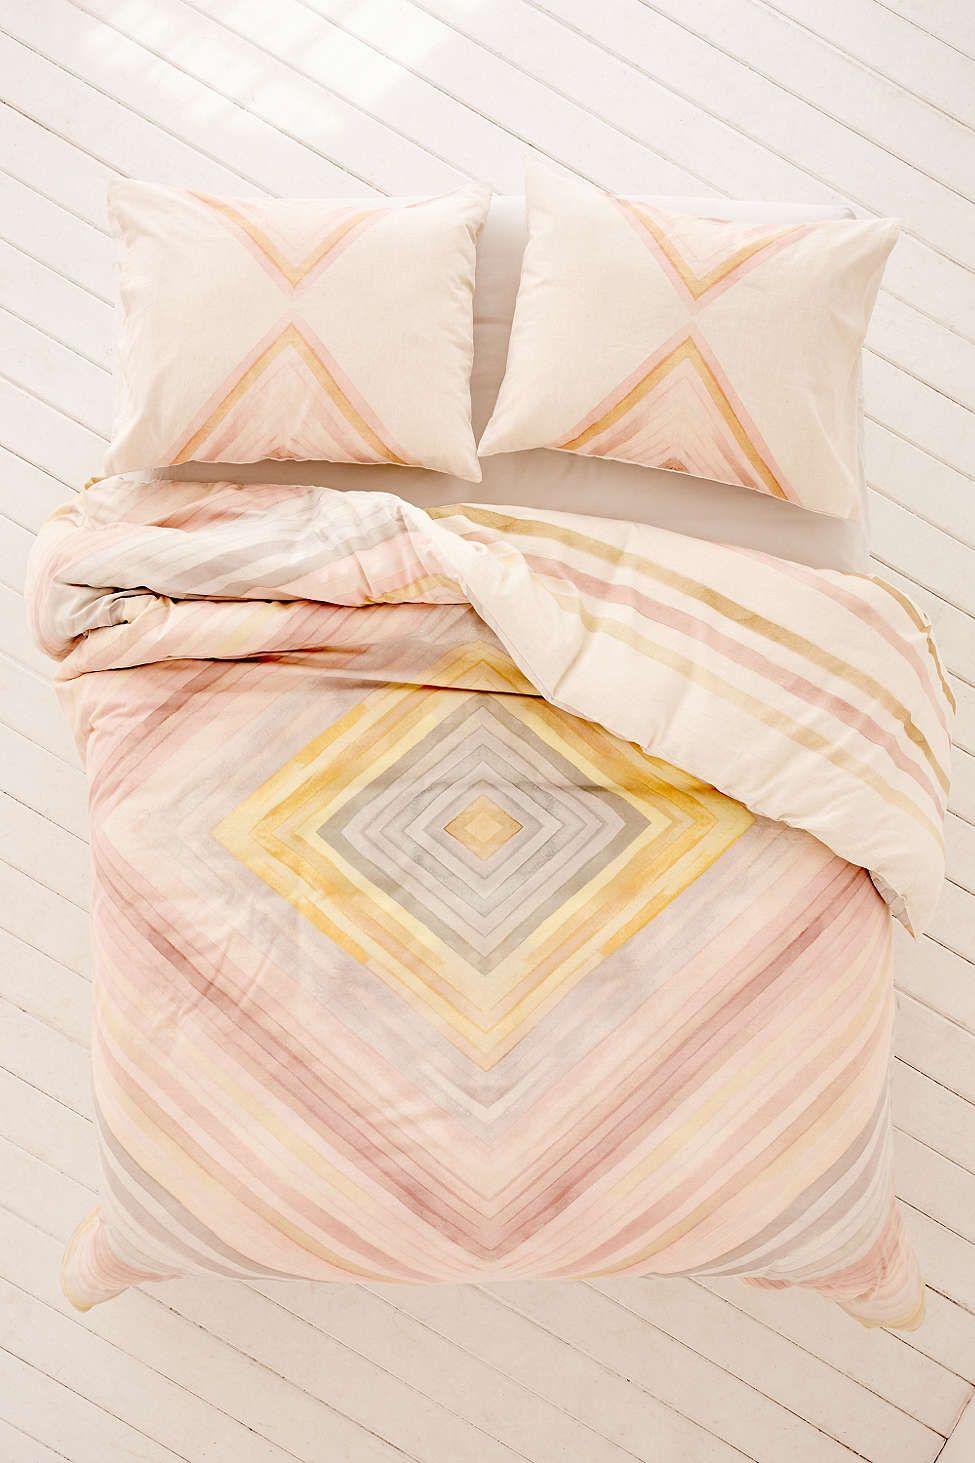 Hodad Reversible Watercolor Linen Blend Duvet Cover - Urban Outfitters